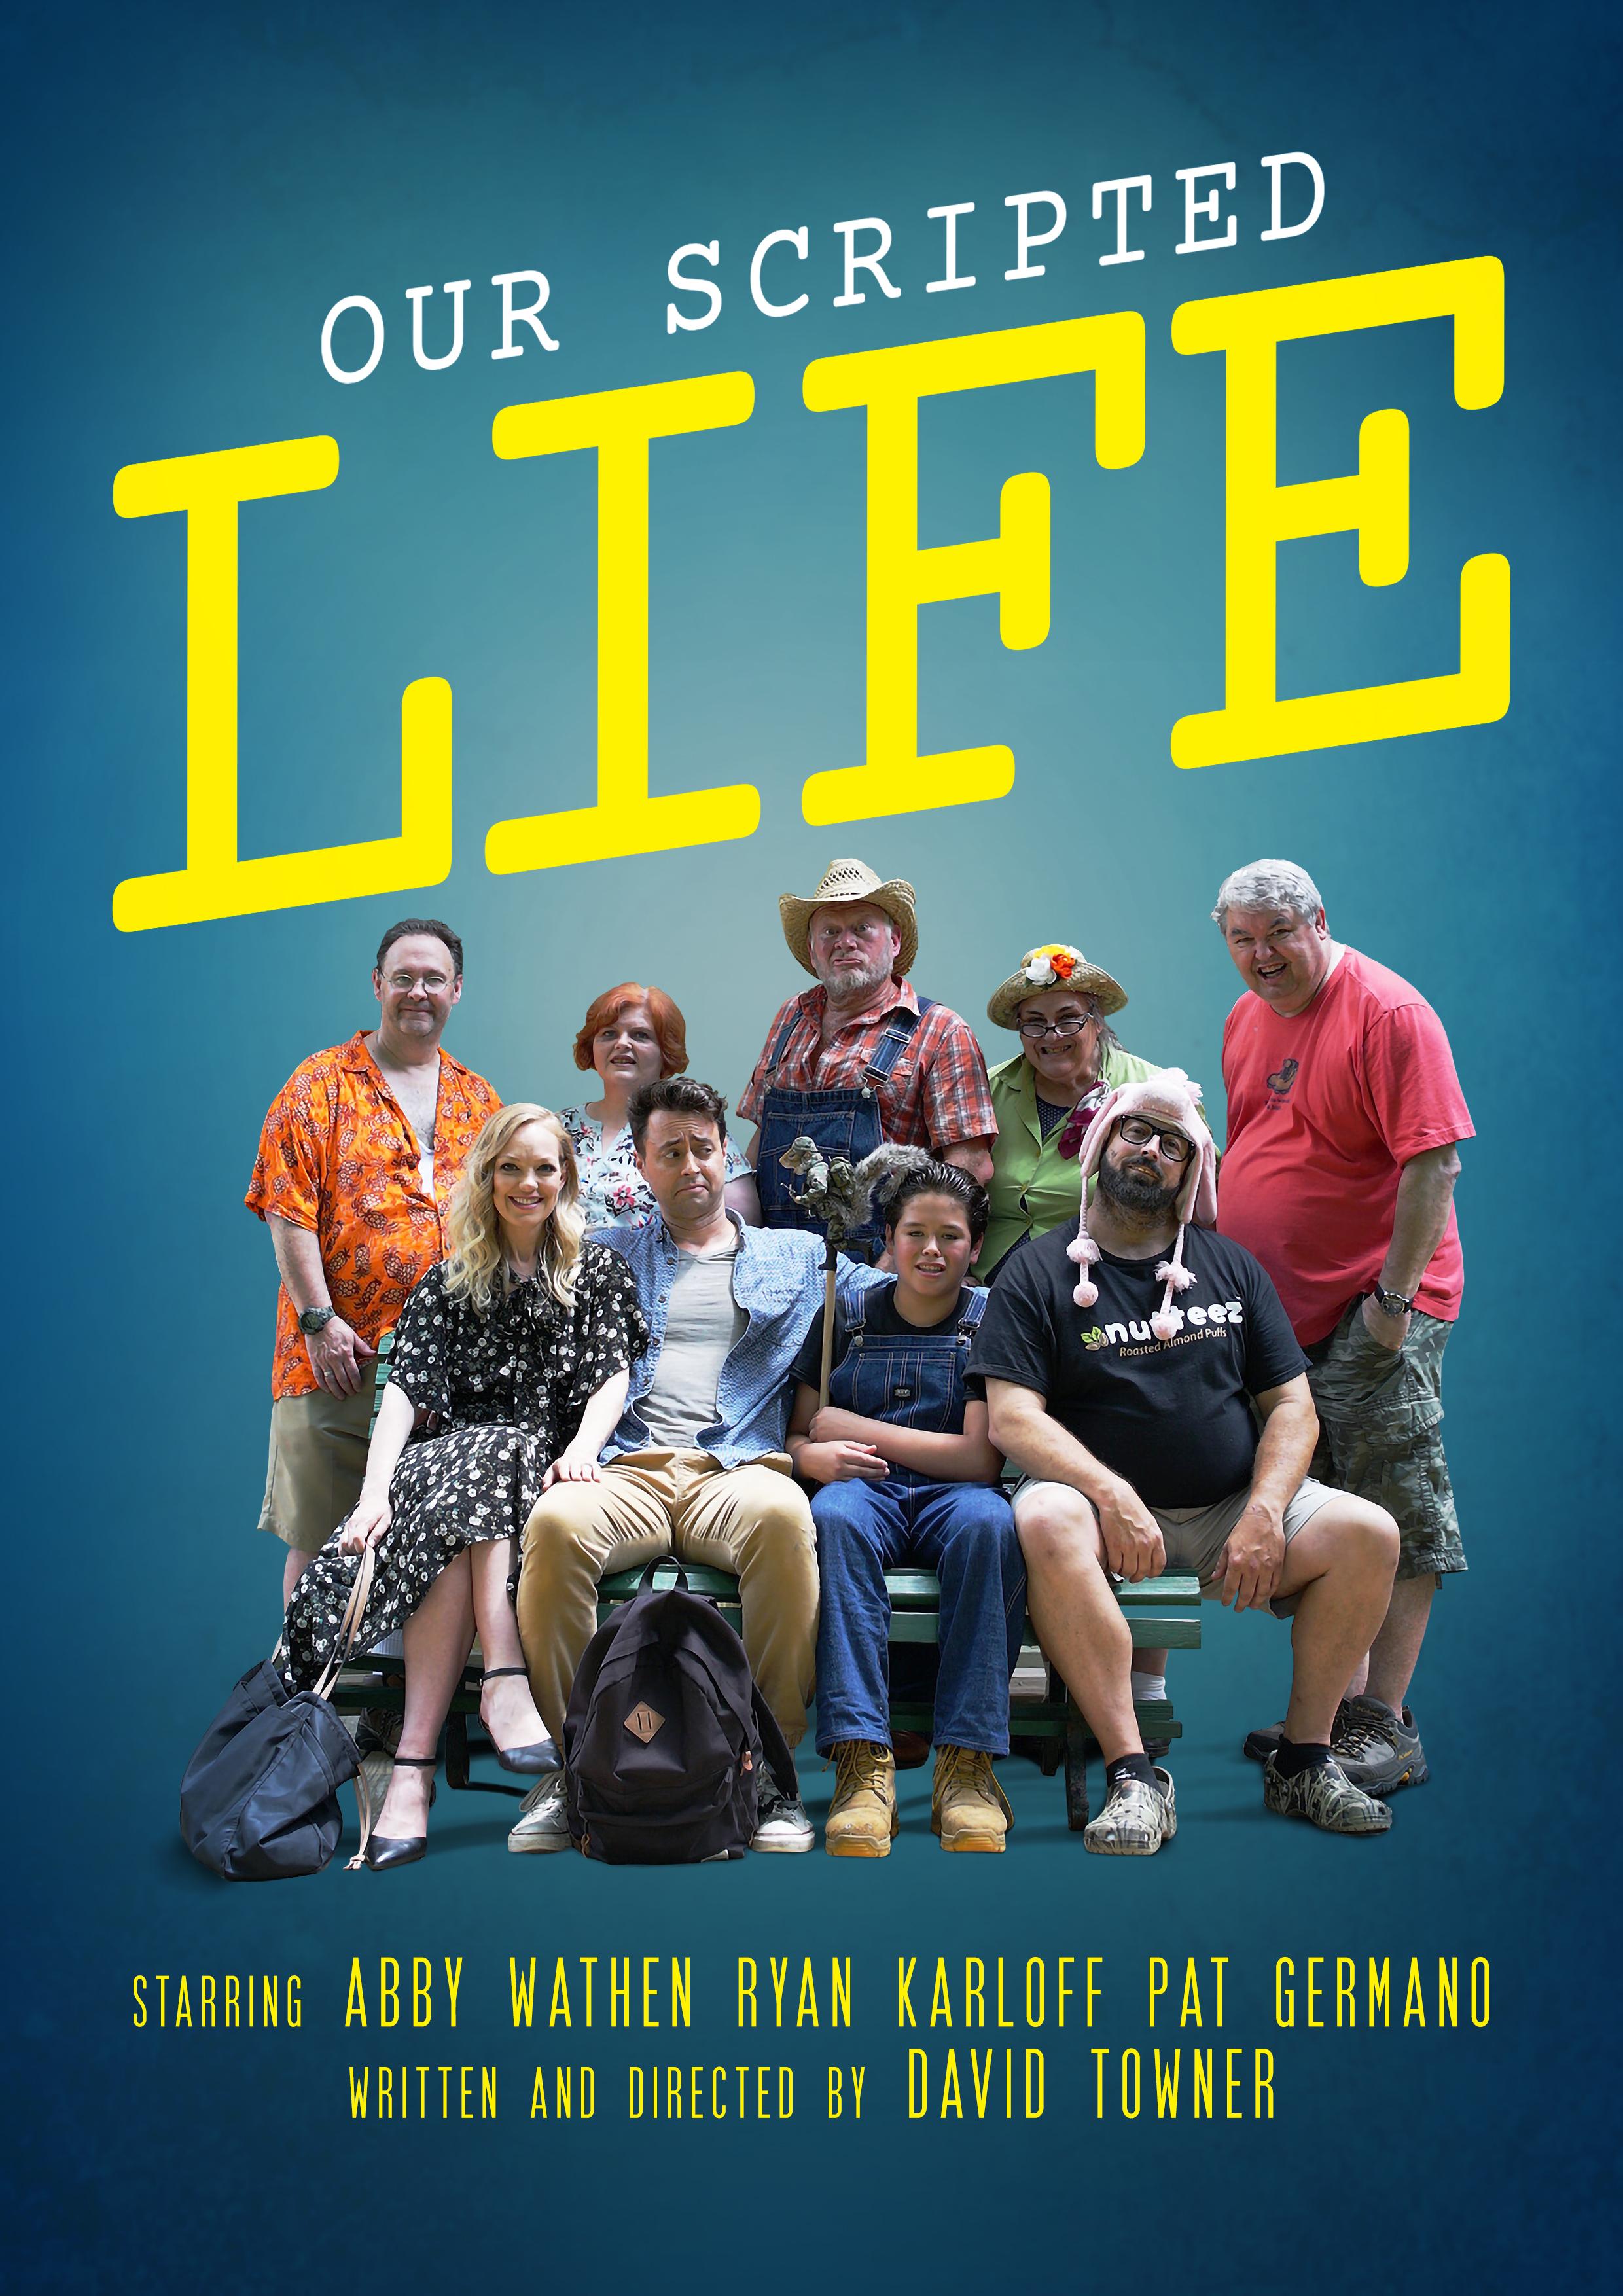 Zaide Avila, Melissia Gary, Sara Beringer, Perry Gary, Jay Fultz, Abby Wathen, David Towner, Ryan Karloff, and Jon Vater in Our Scripted Life (2020)